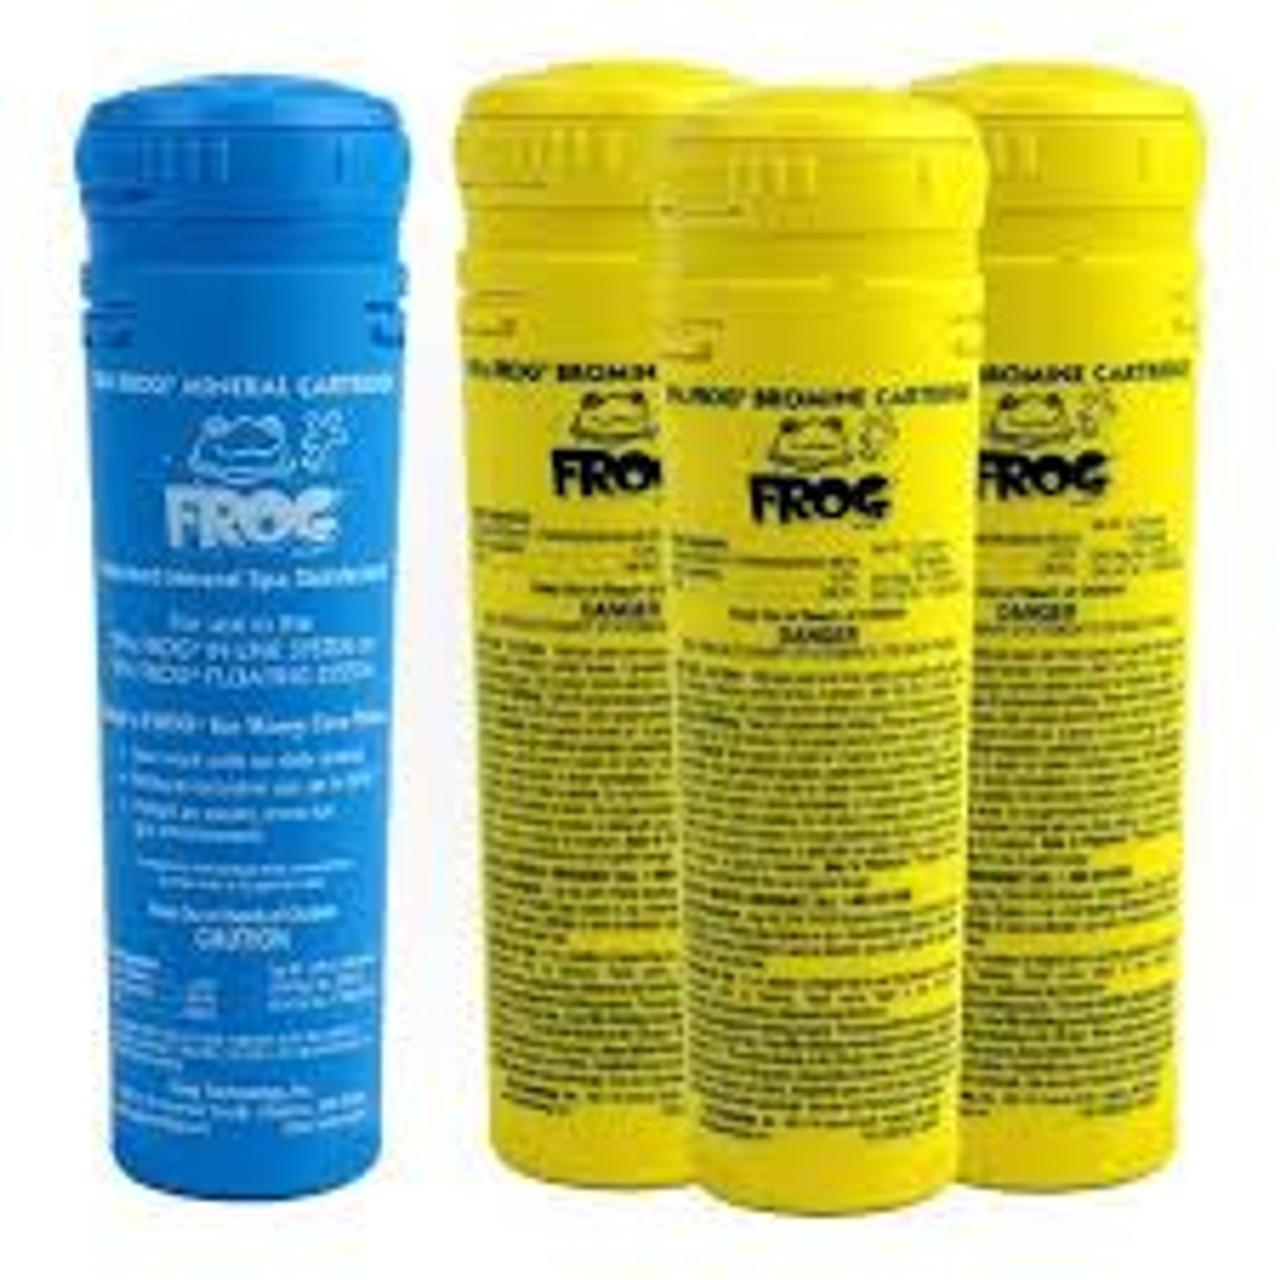 King Technology Spa Frog Cartridge Refill Kit